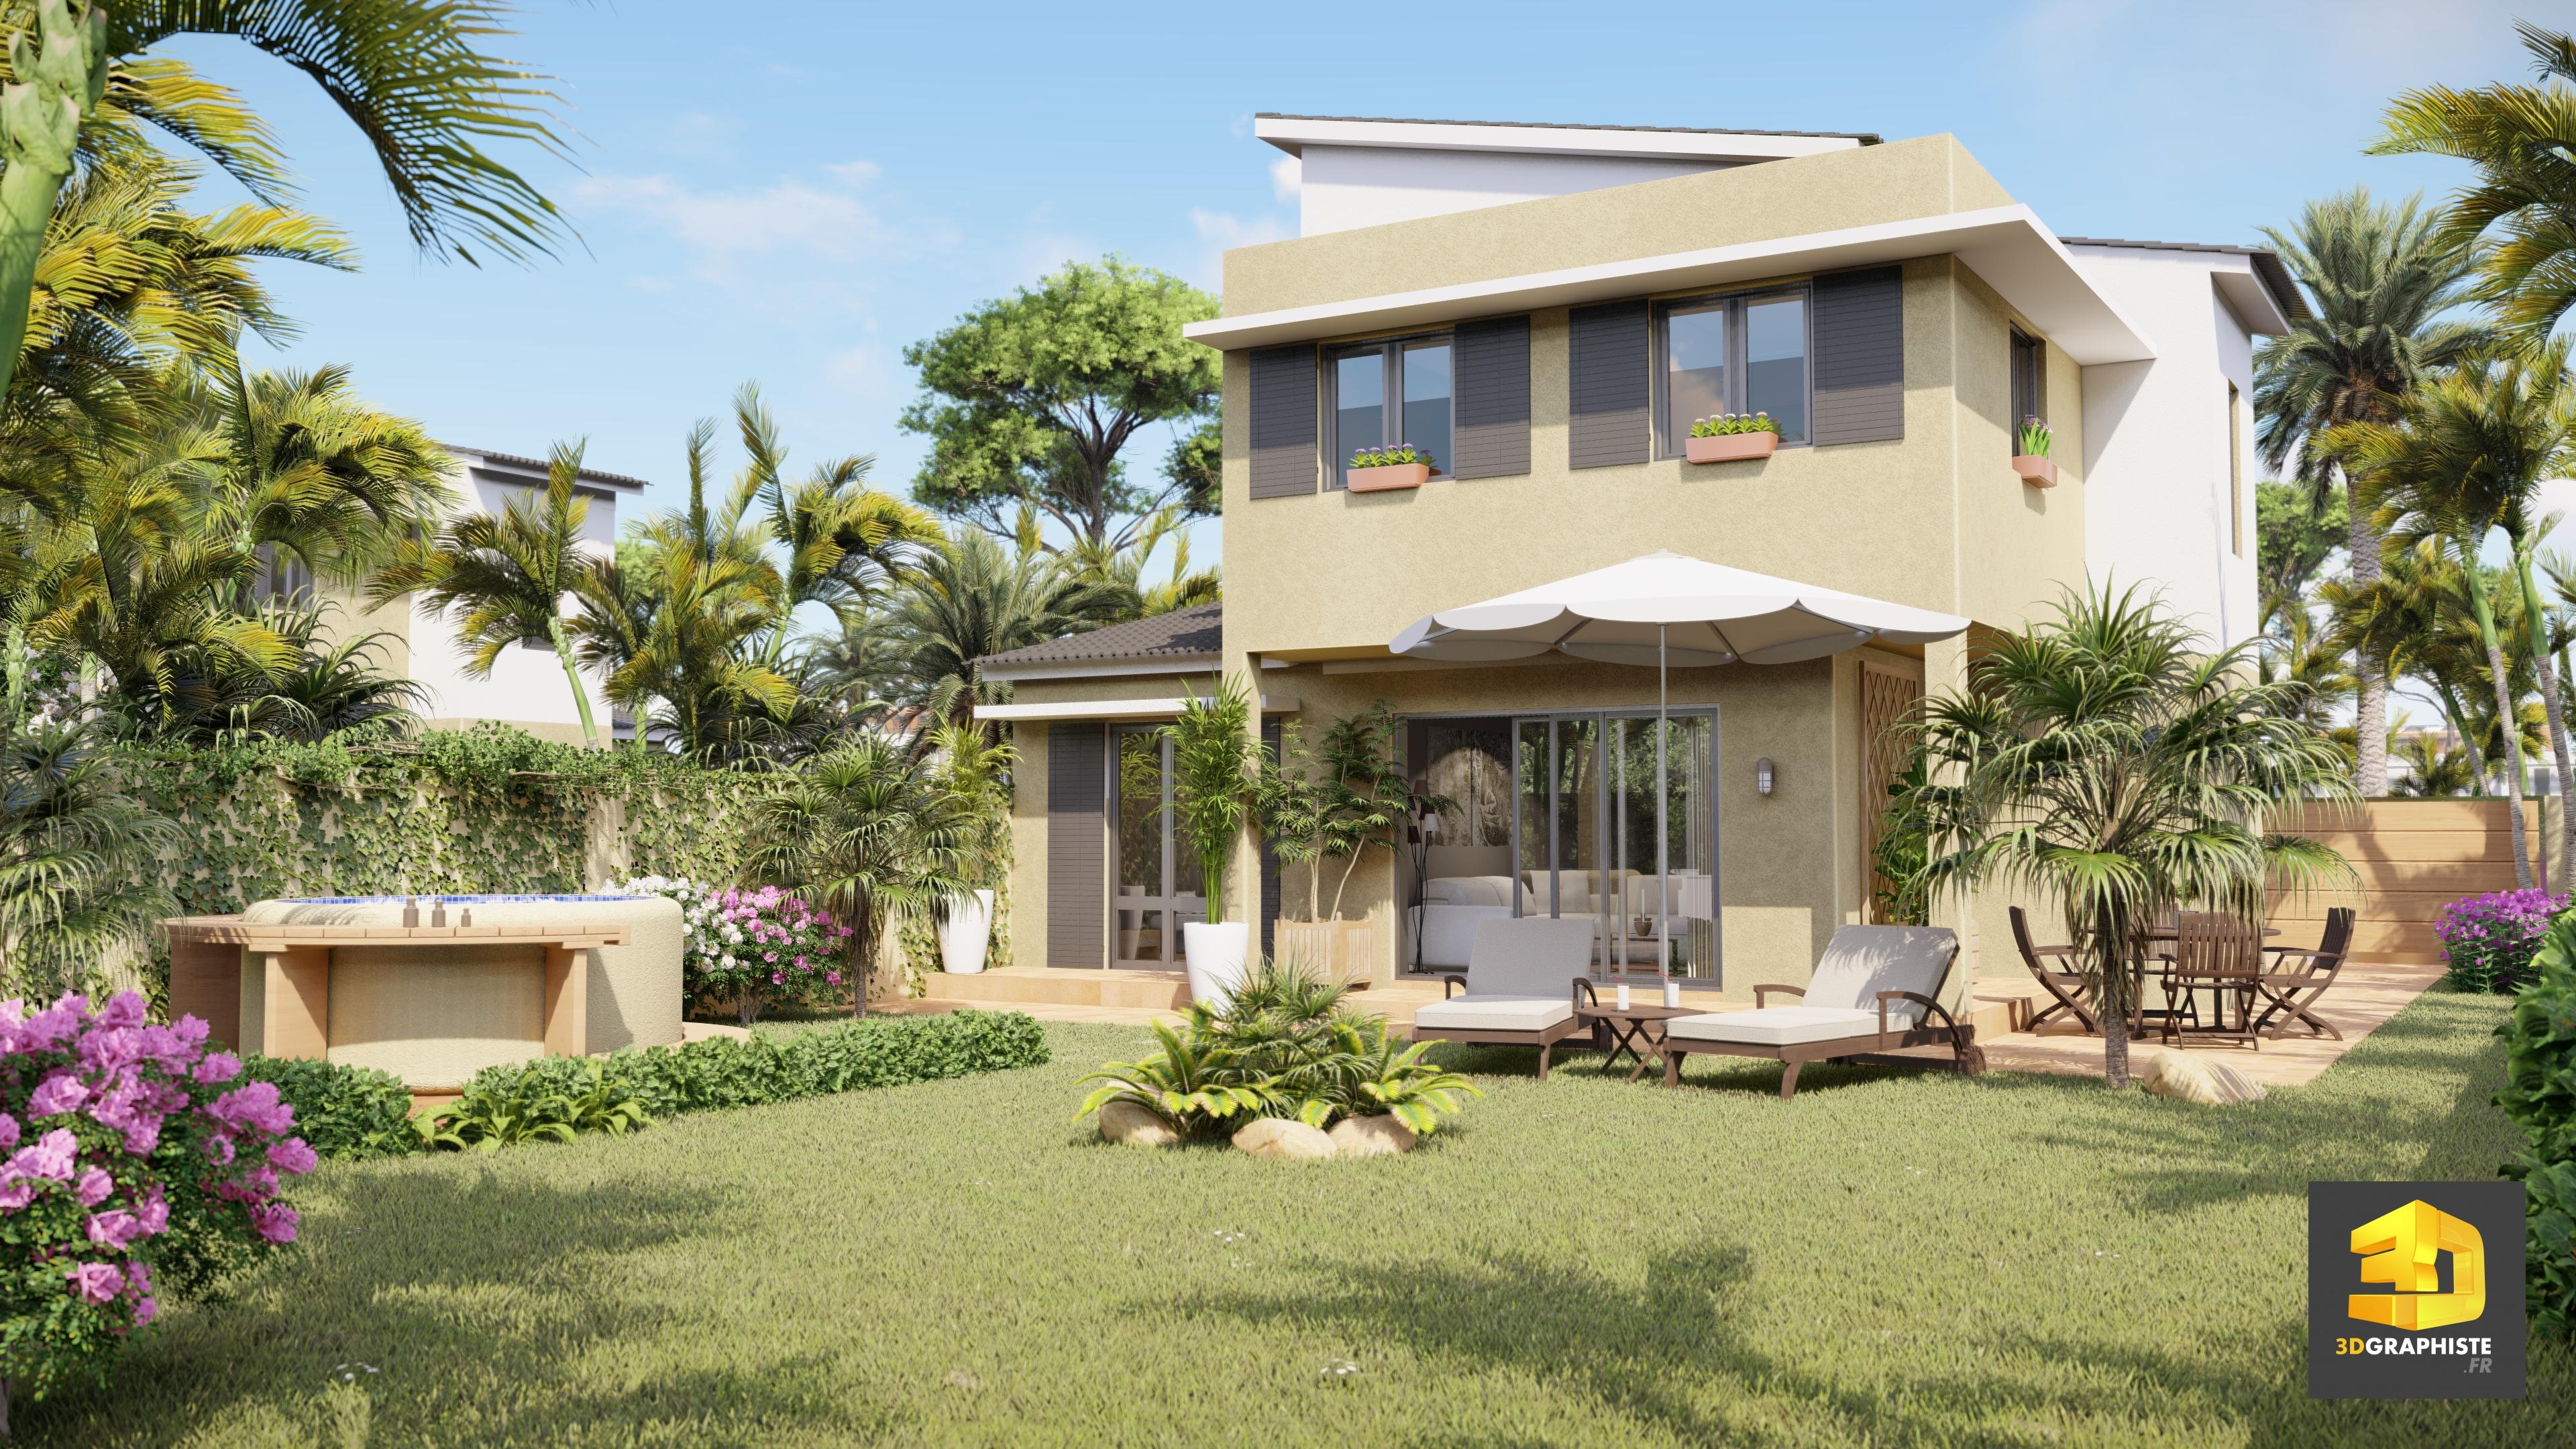 Maison guyane fabulous maison m sur uu with maison guyane - Villa maribyrnong par grant maggs architects ...